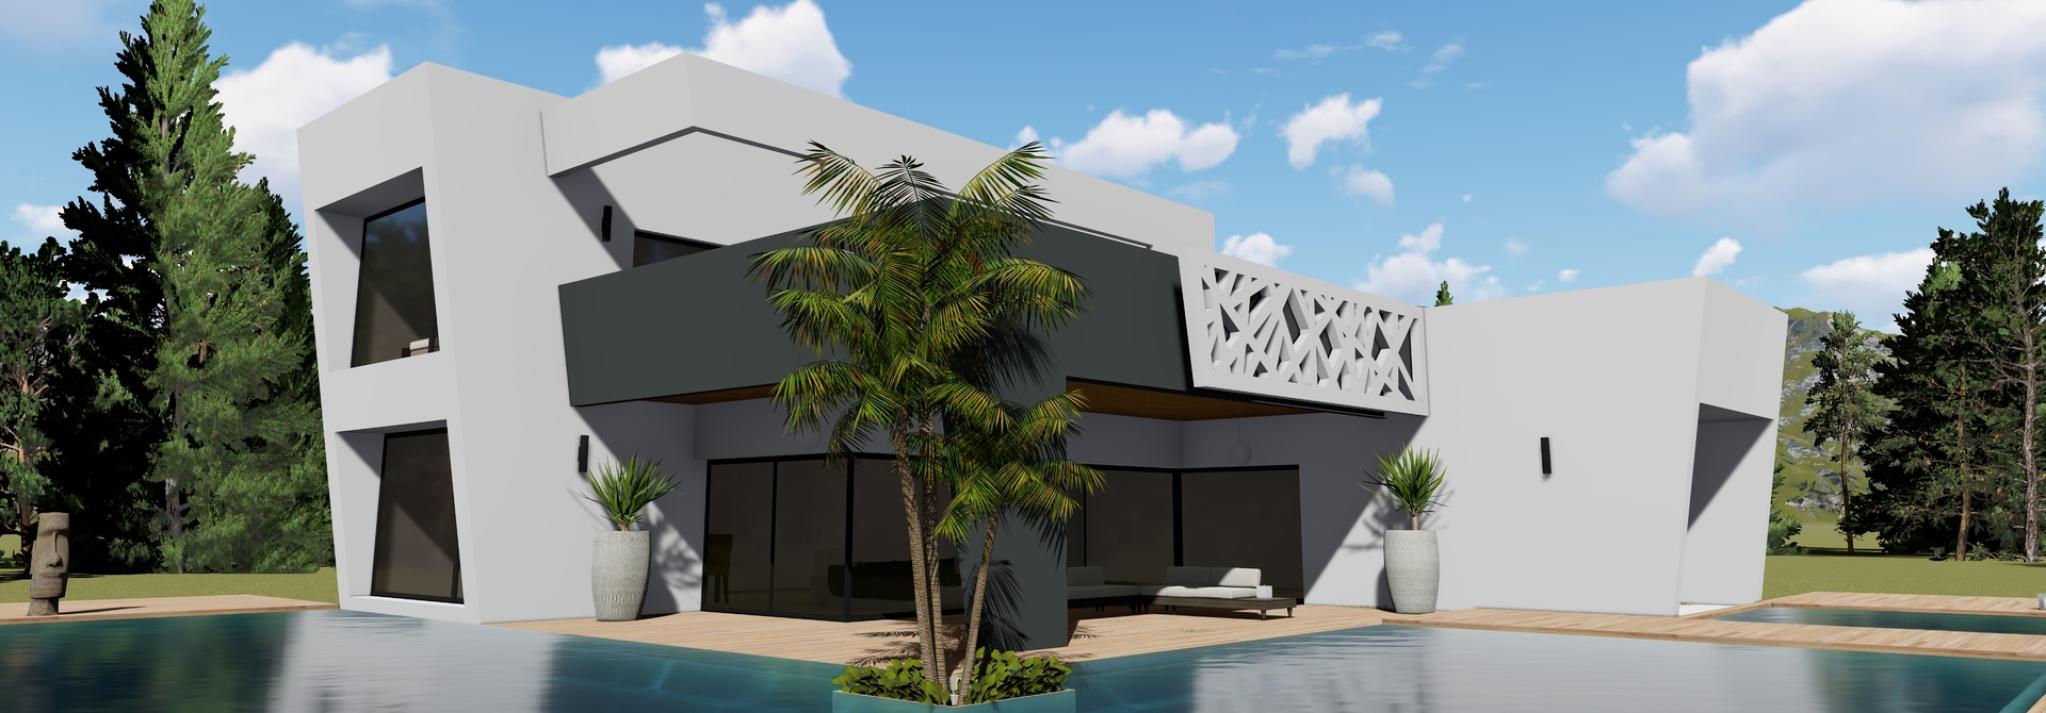 Modunova casas prefabricadas de hormig n en sevilla inicio - Casas prefabricadas en malaga ...